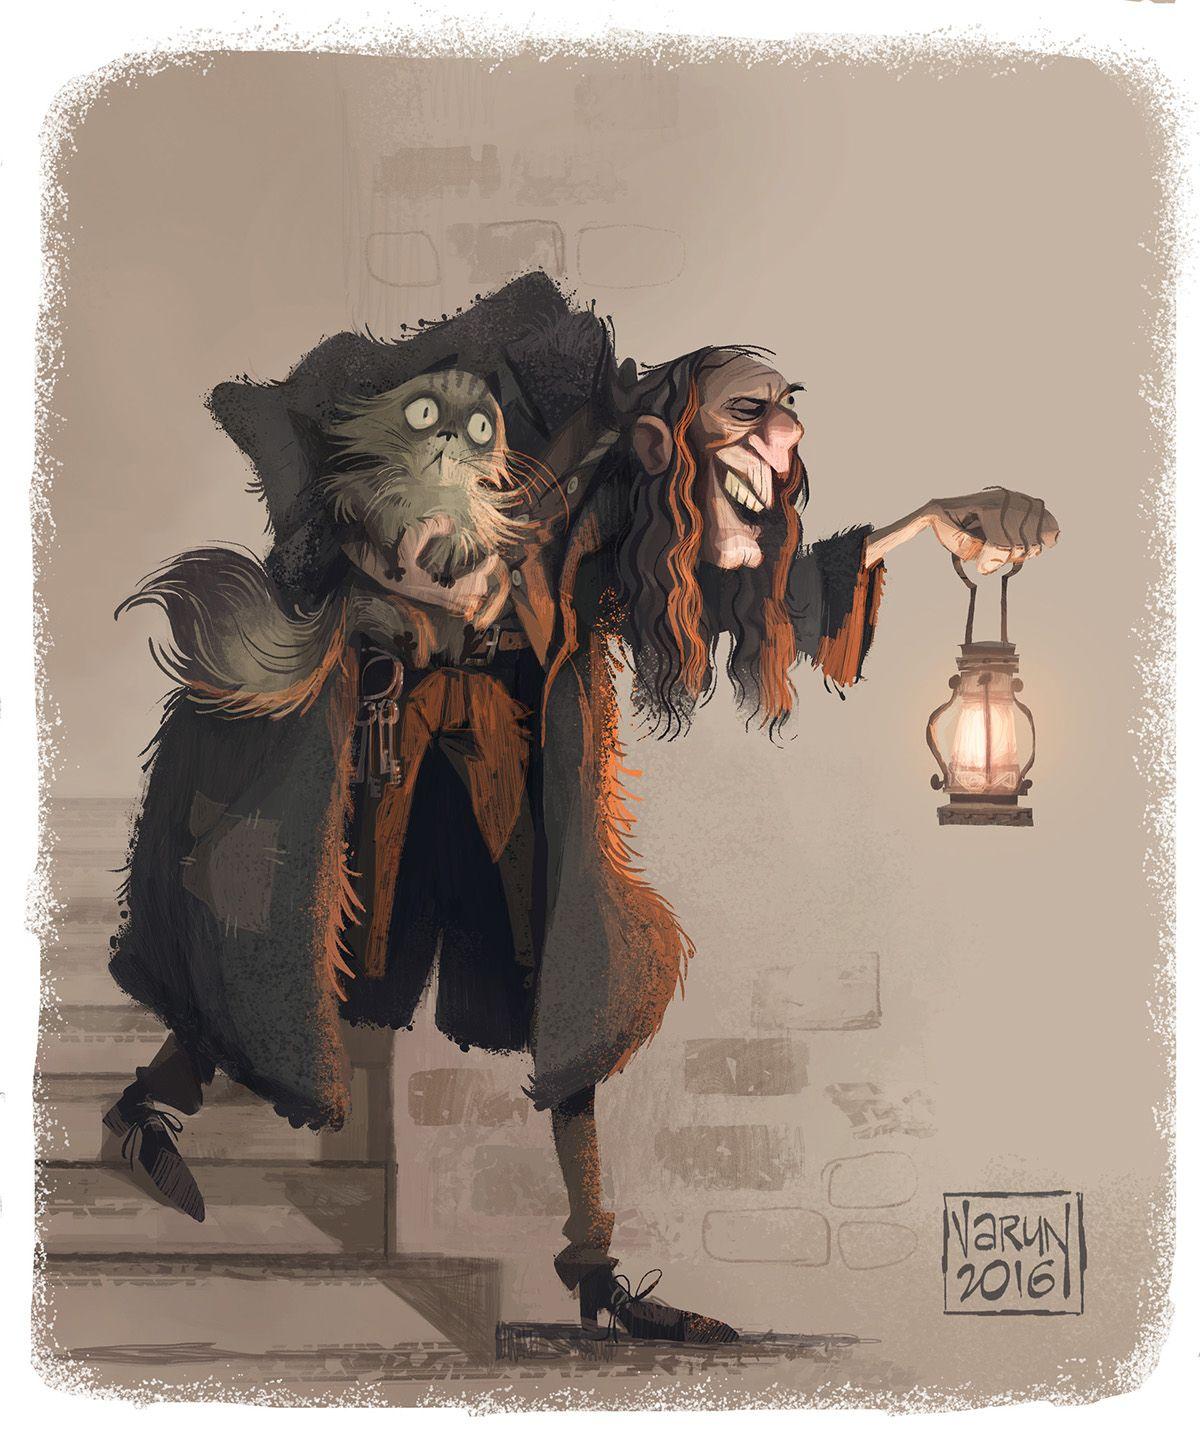 Argus Filch Harrypotter Character Design On Behance Harry Potter Illustrations Harry Potter Drawings Harry Potter Artwork